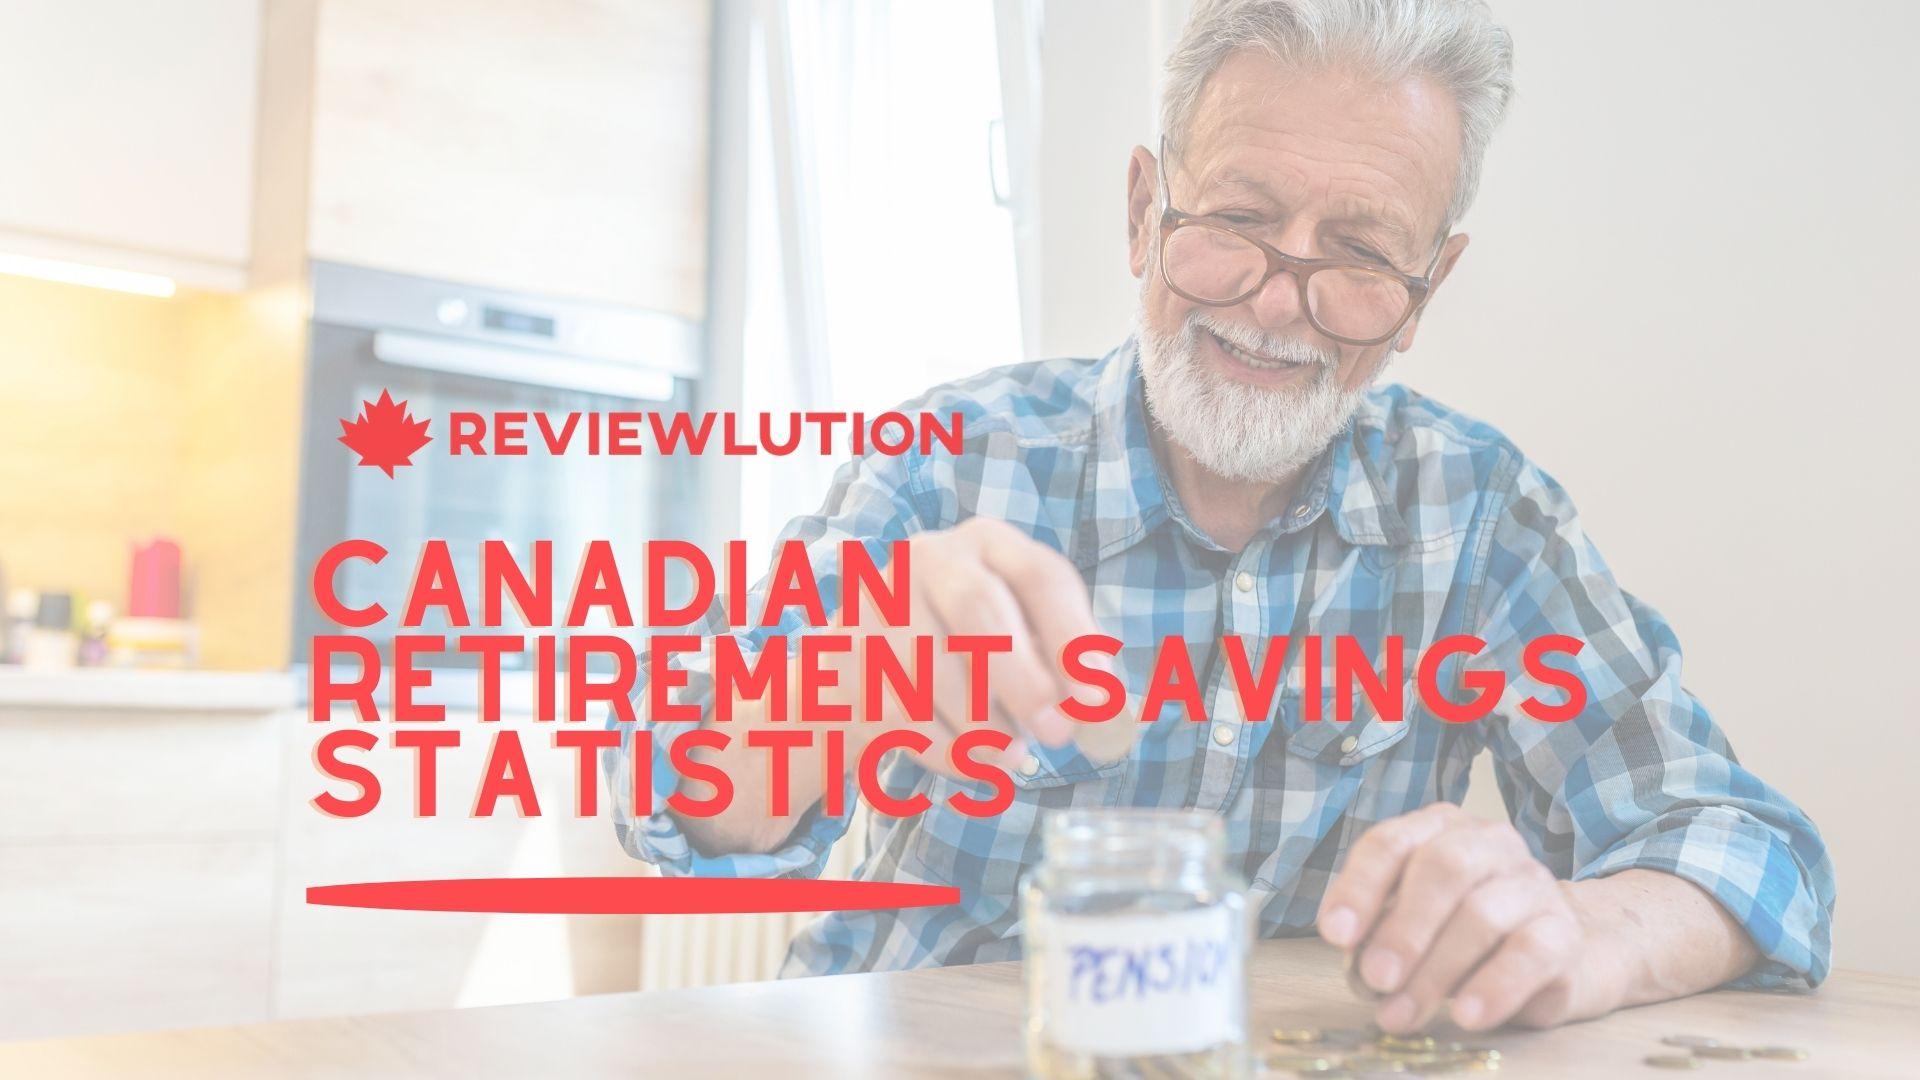 37 Canadian Retirement Savings Statistics to Keep You Warm